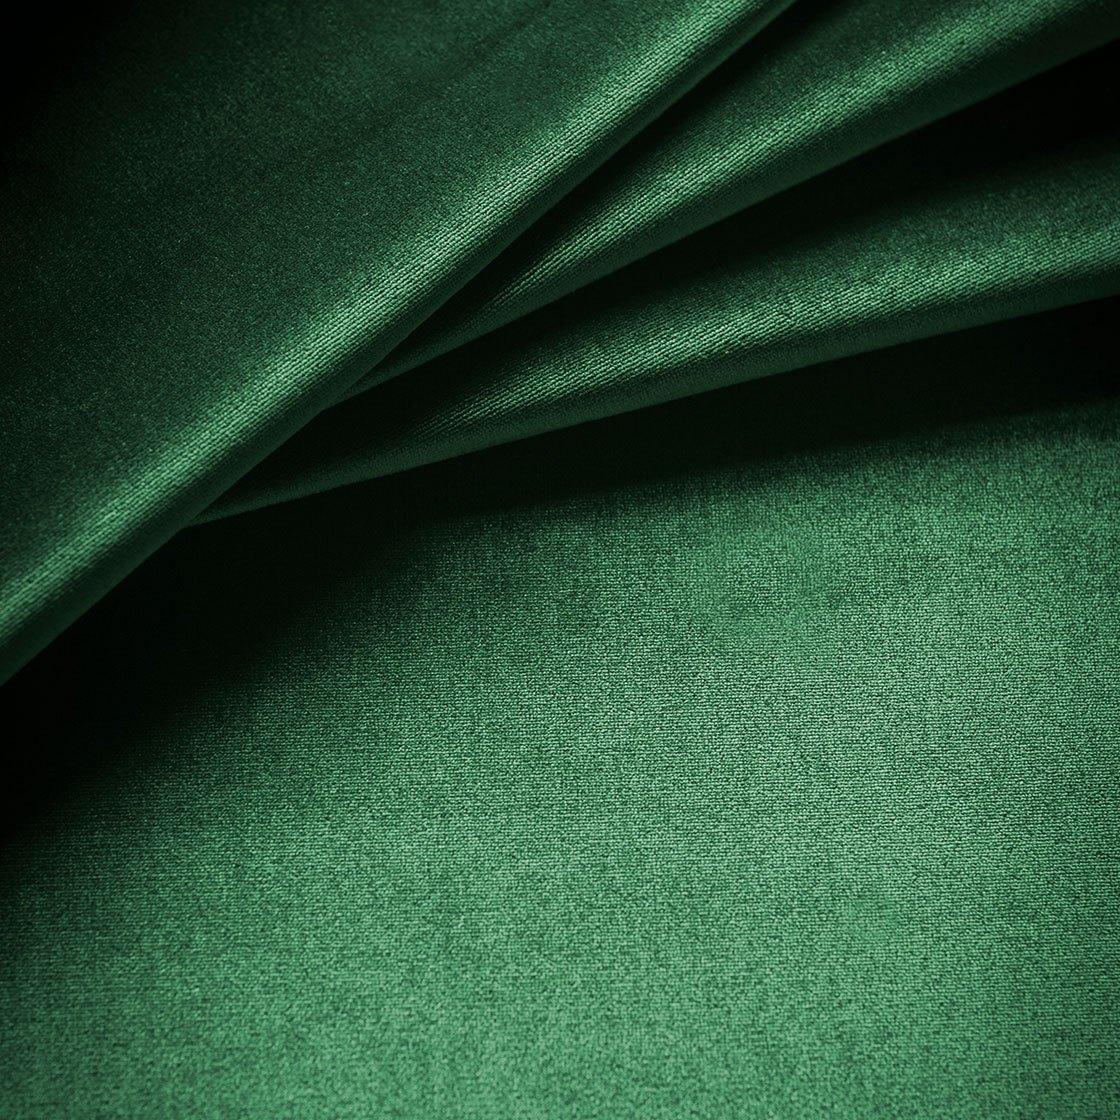 Capri Silk Velvet - Emerald - Beaumont & Fletcher - Beaumont & Fletcher